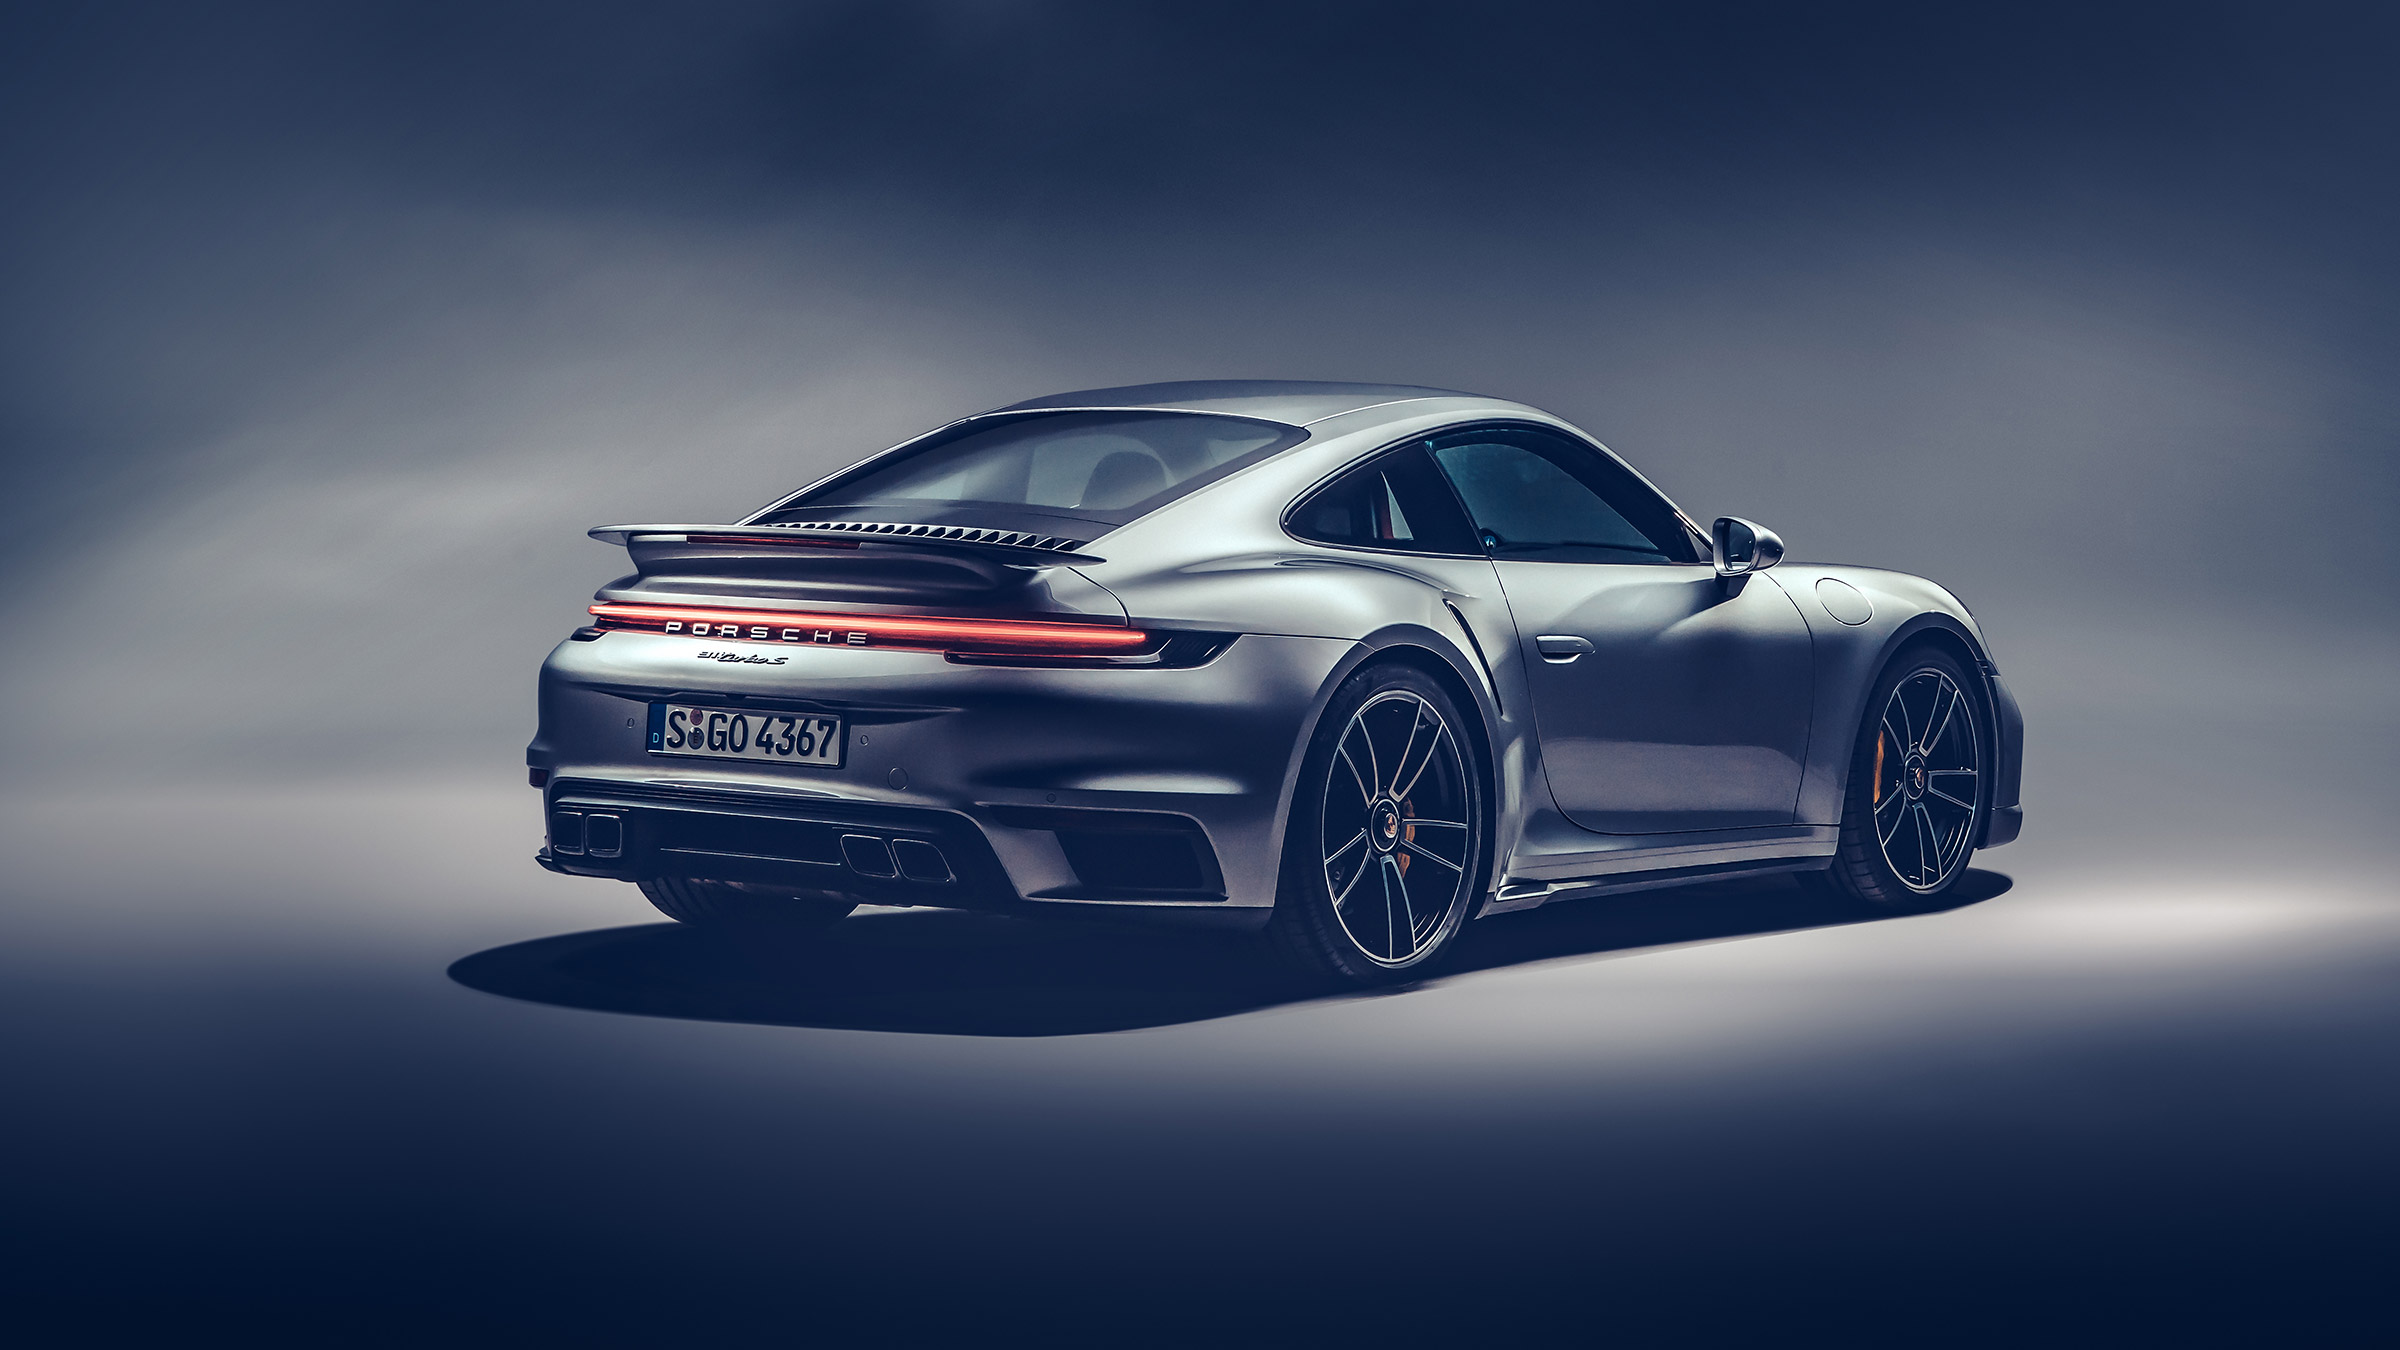 New 2020 Porsche 911 Turbo S Revealed Evo